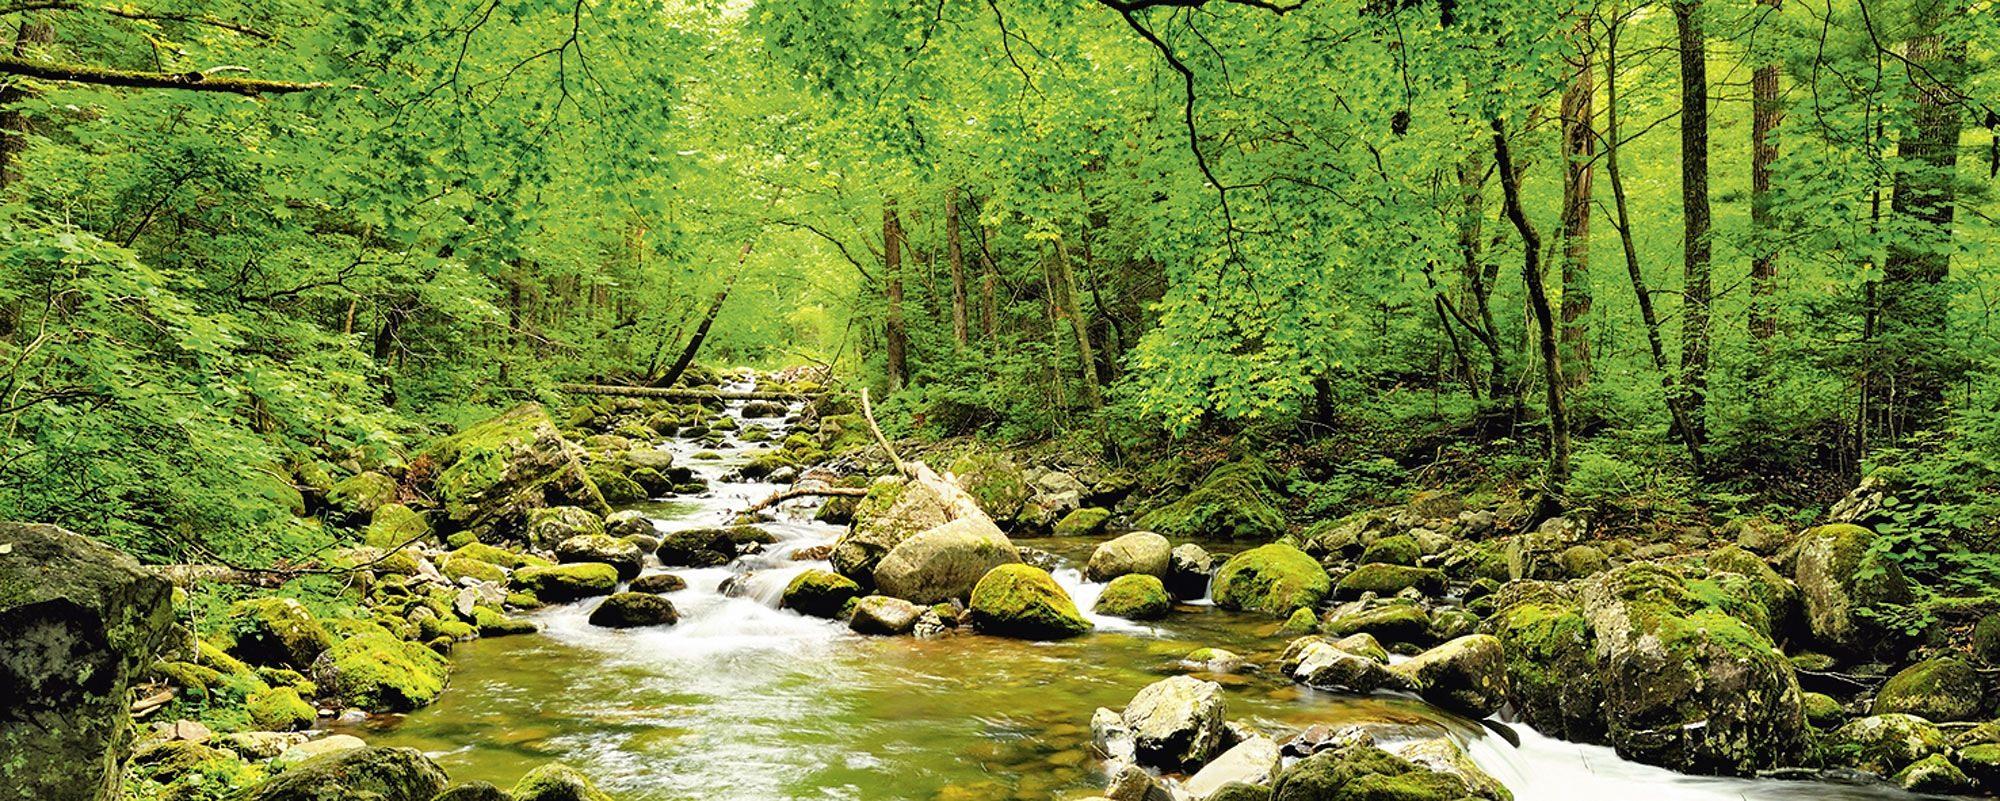 Home affaire Glasbild »tupikov: Herbstwald, Fluß Smolny«, 125/50 cm